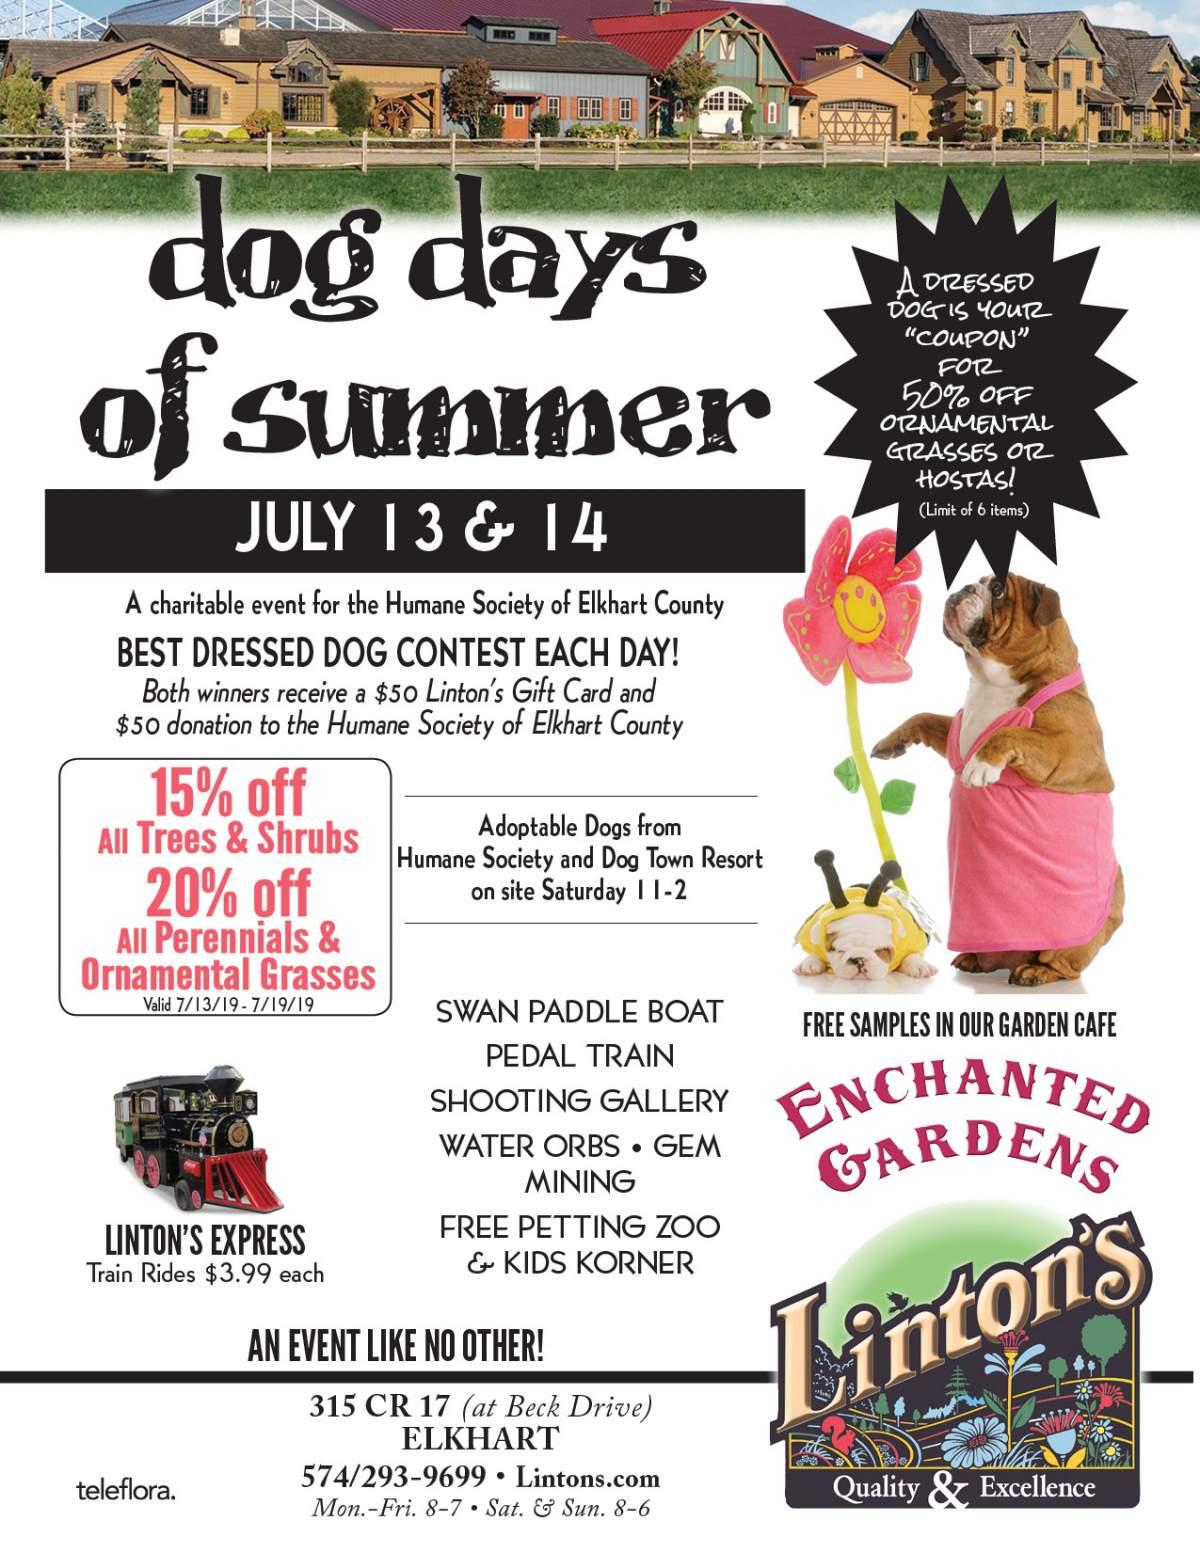 Linton's Enchanted Gardens : DogDays Flyer